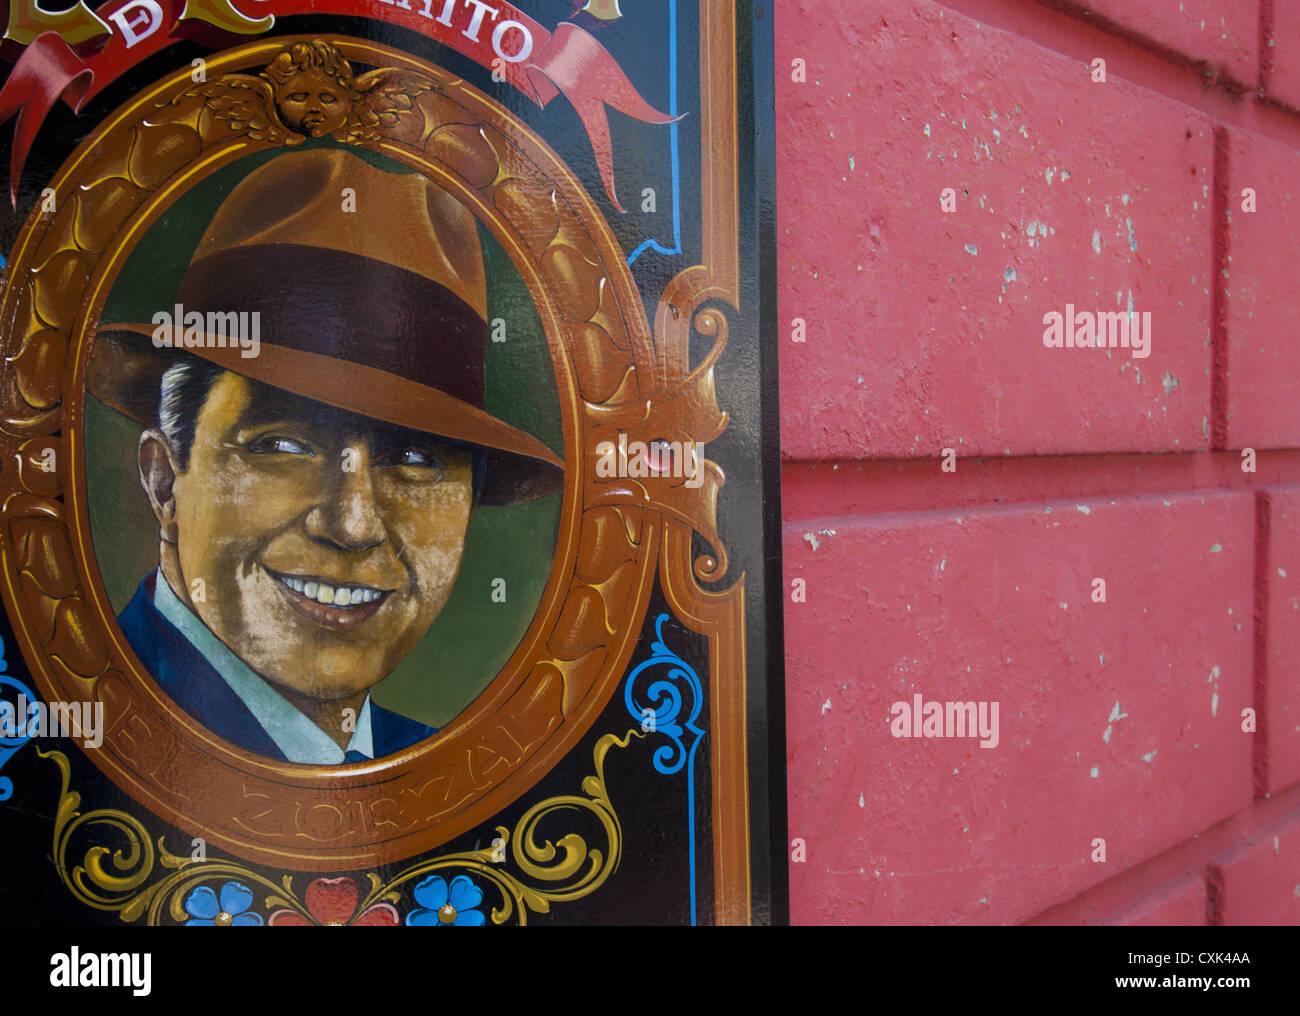 Carlos Gardel auf La Perla Cafe & Bar, Baujahr 1899, Buenos Aires, Argentinien, Südamerika Stockbild